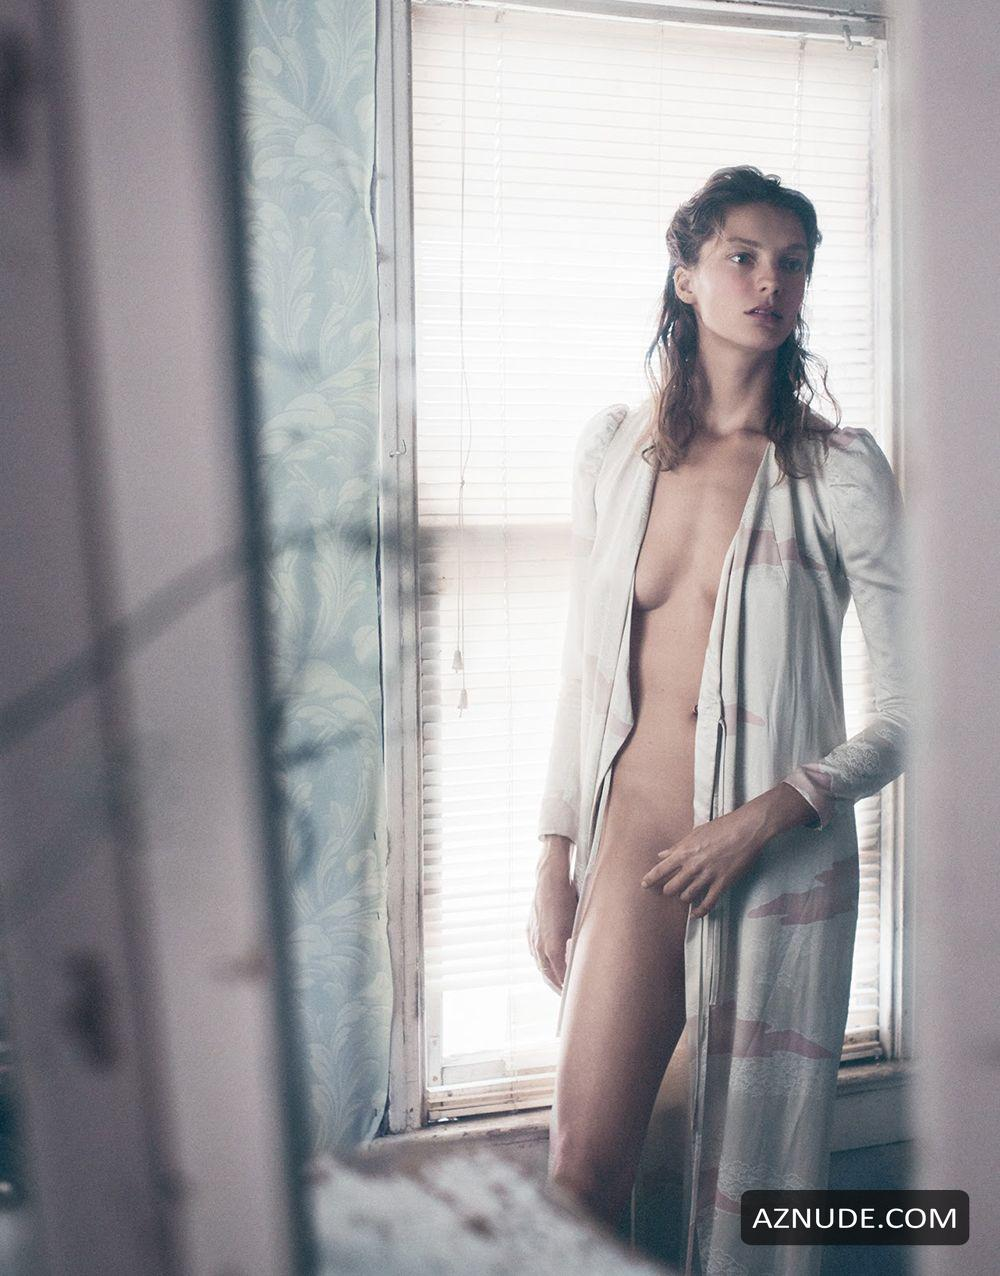 Rio sage sexy topless 9 Photos,Alexandra saitova sexy Adult clips Lyna perez 2019,Natalie massenet sexy